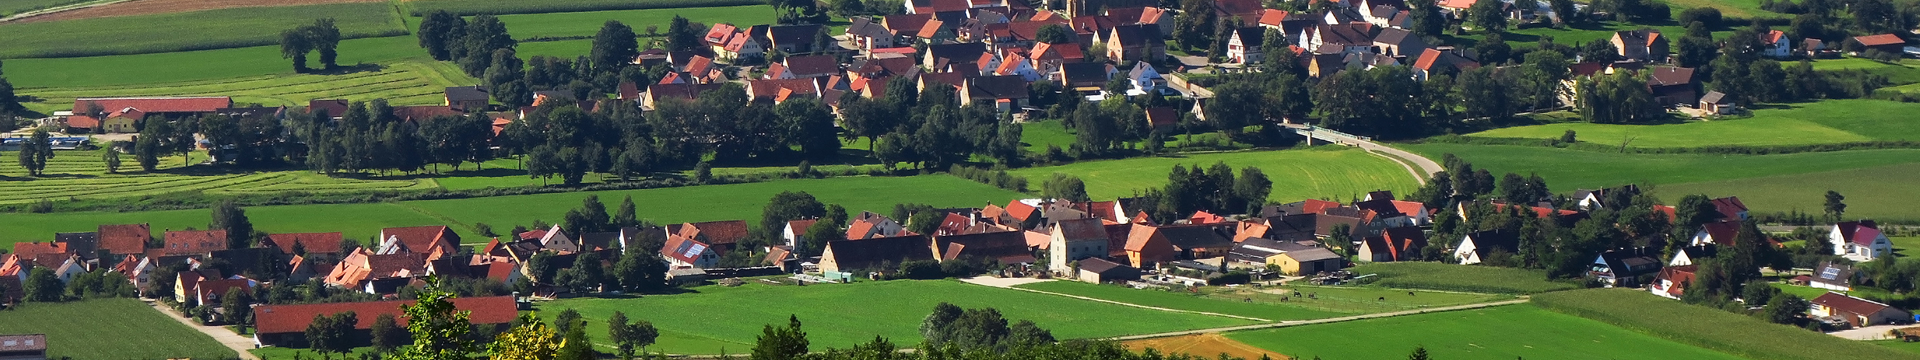 Langfurth